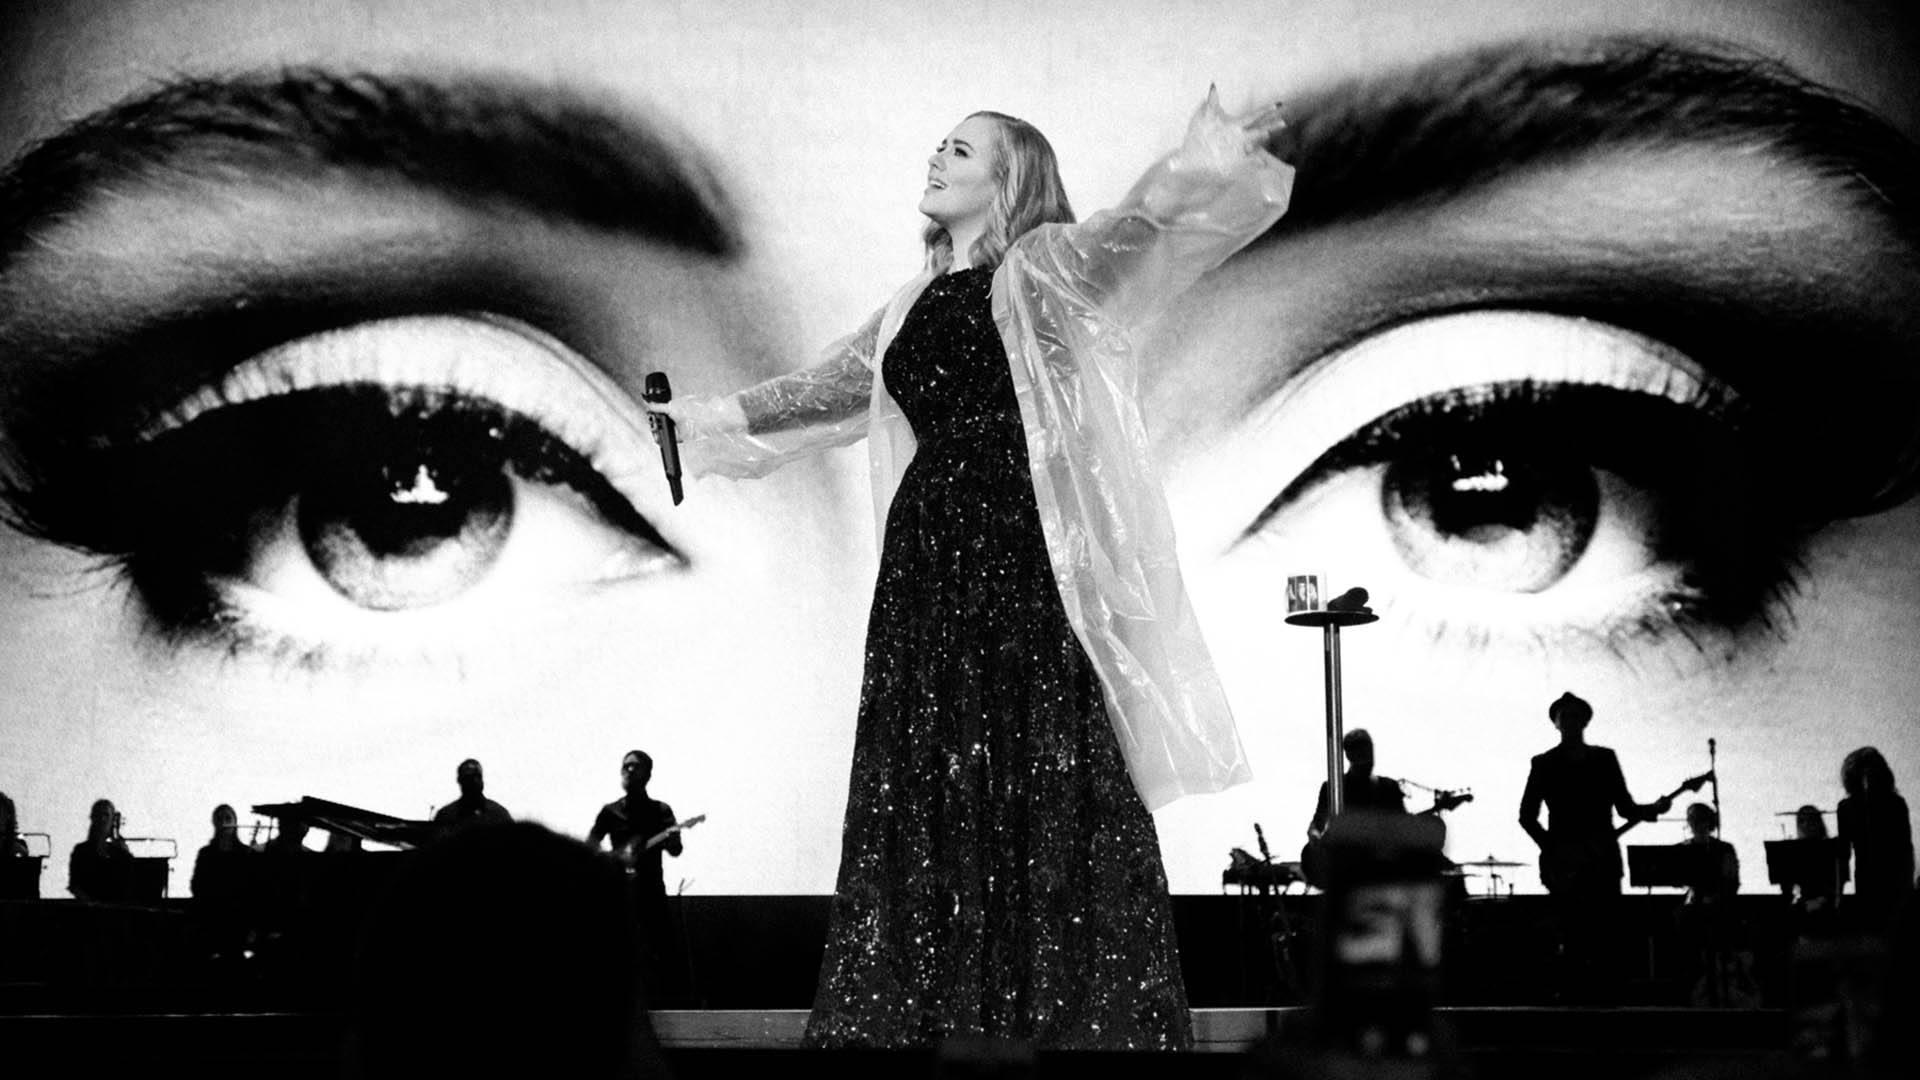 Adele all'Arena di Verona. Miele, battute e una voce milionaria